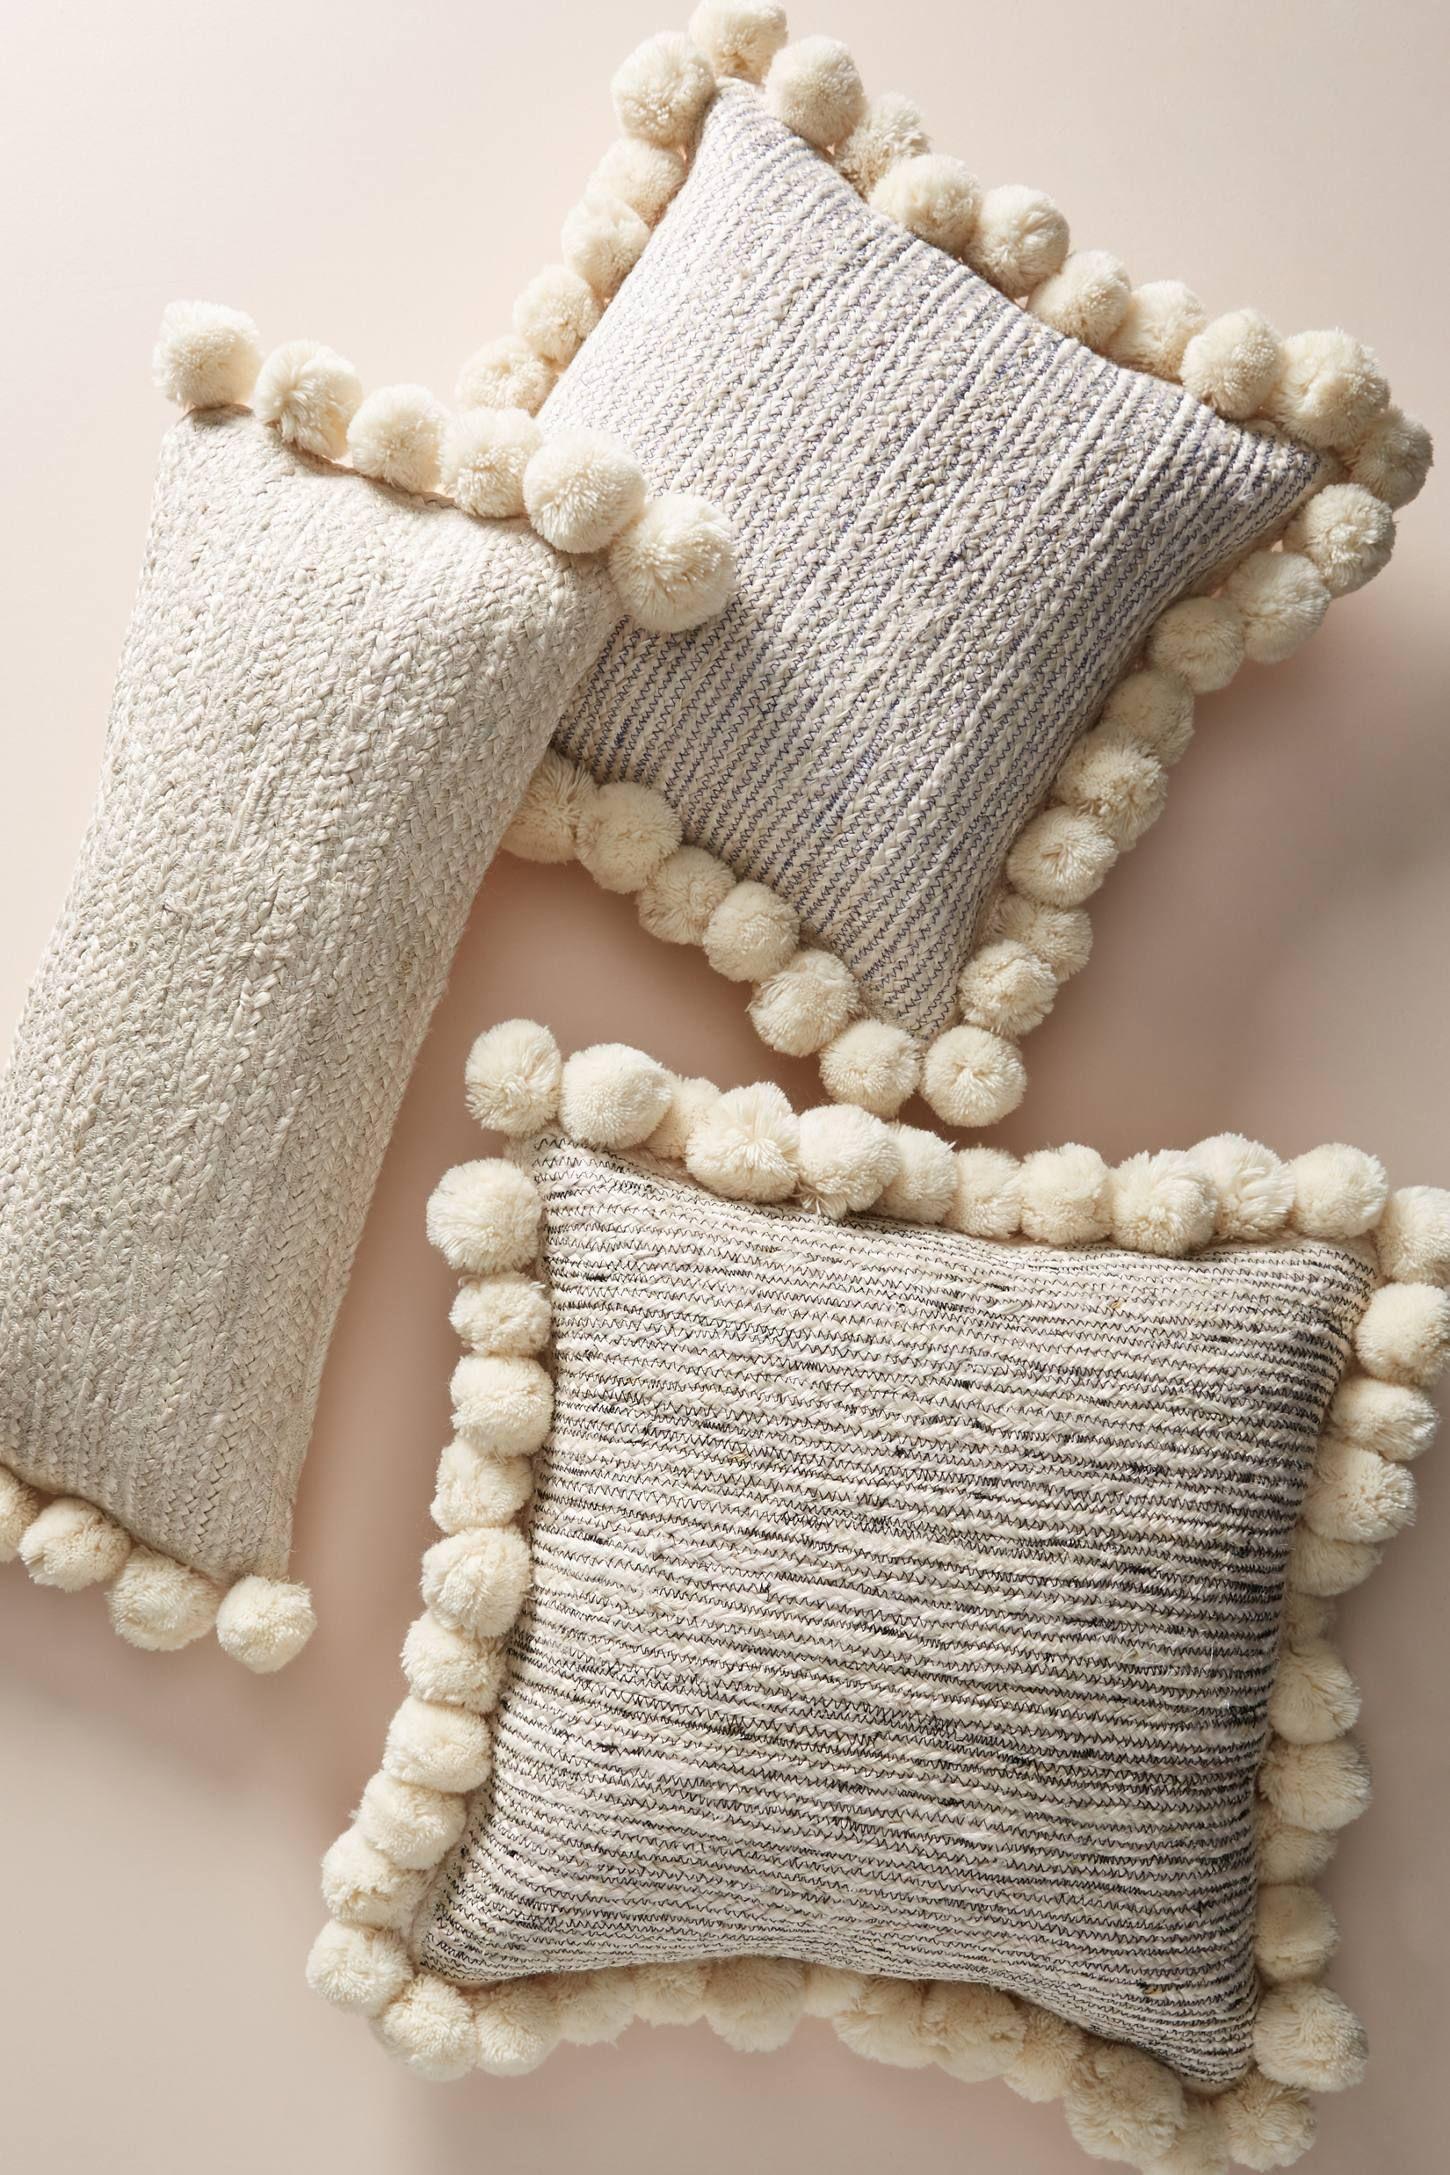 Pommed Jute Pillow With Images Pillows Unique Accent Pillow